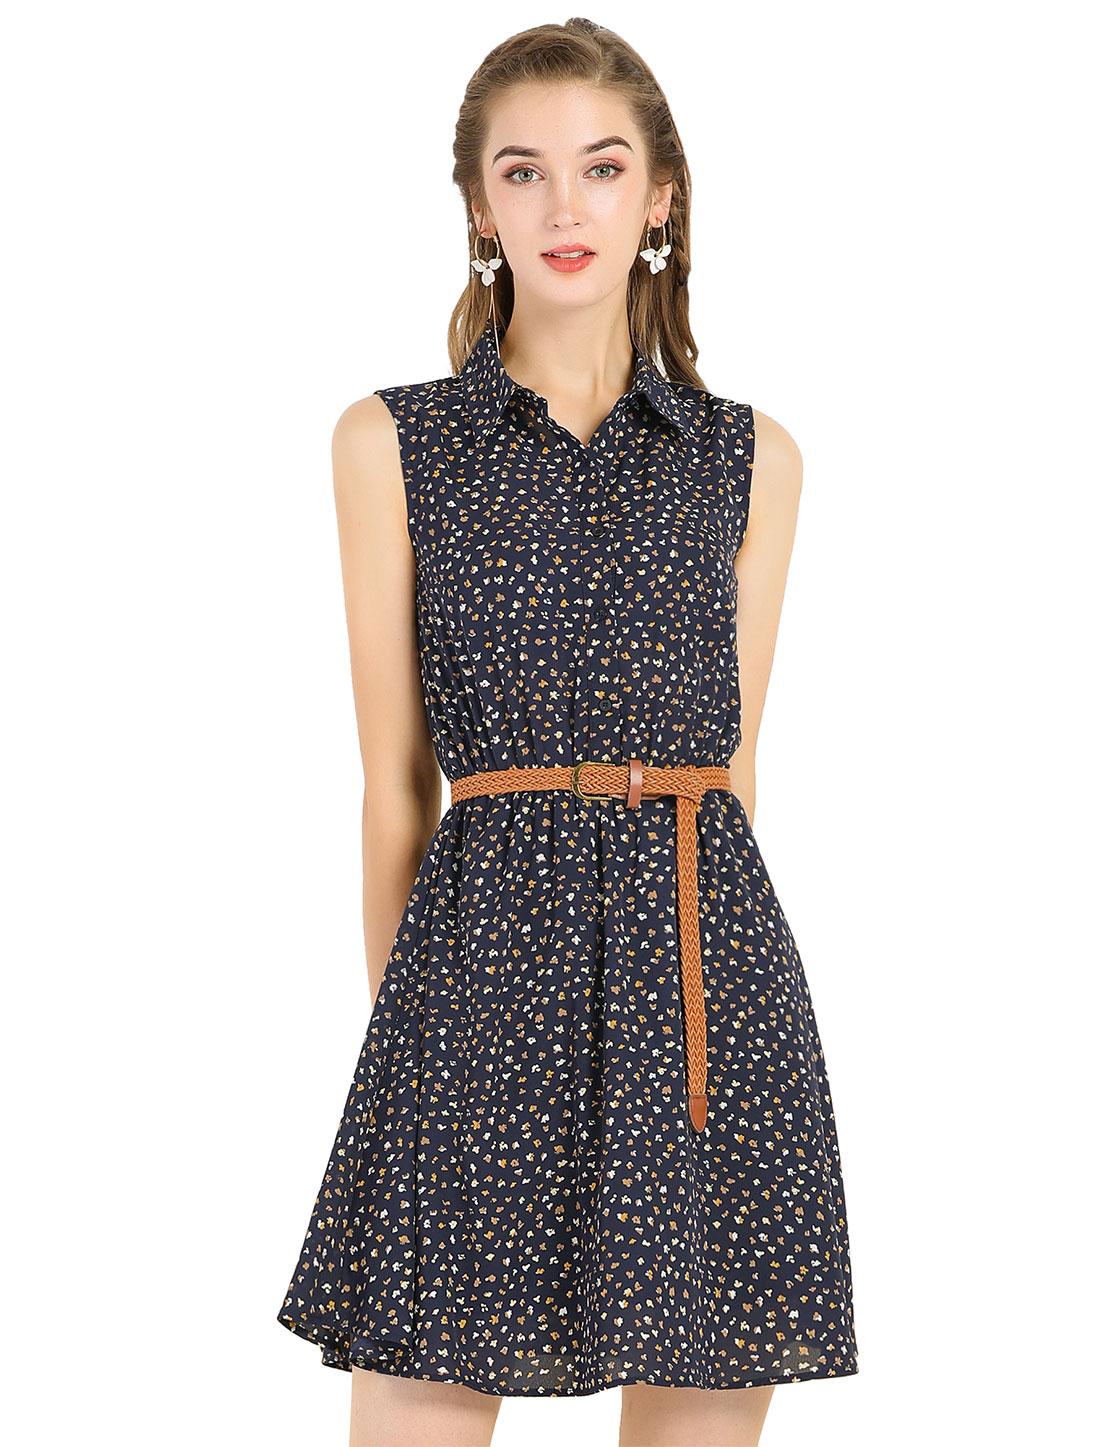 Allegra K Women Printed Sleeveless Belted Dress Dark Blue-Brown Print XS